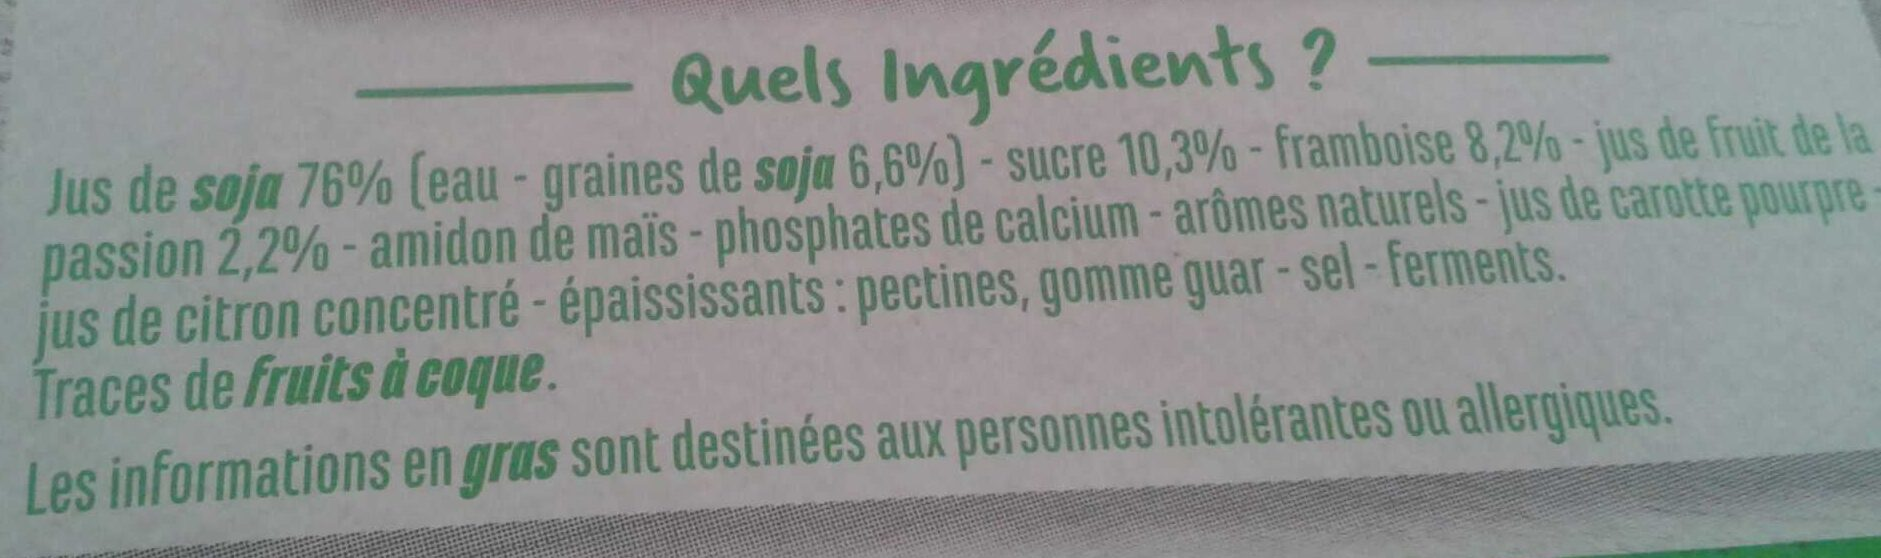 Spécialité au Soja Framboise Passion AUCHAN - Ingrediënten - fr